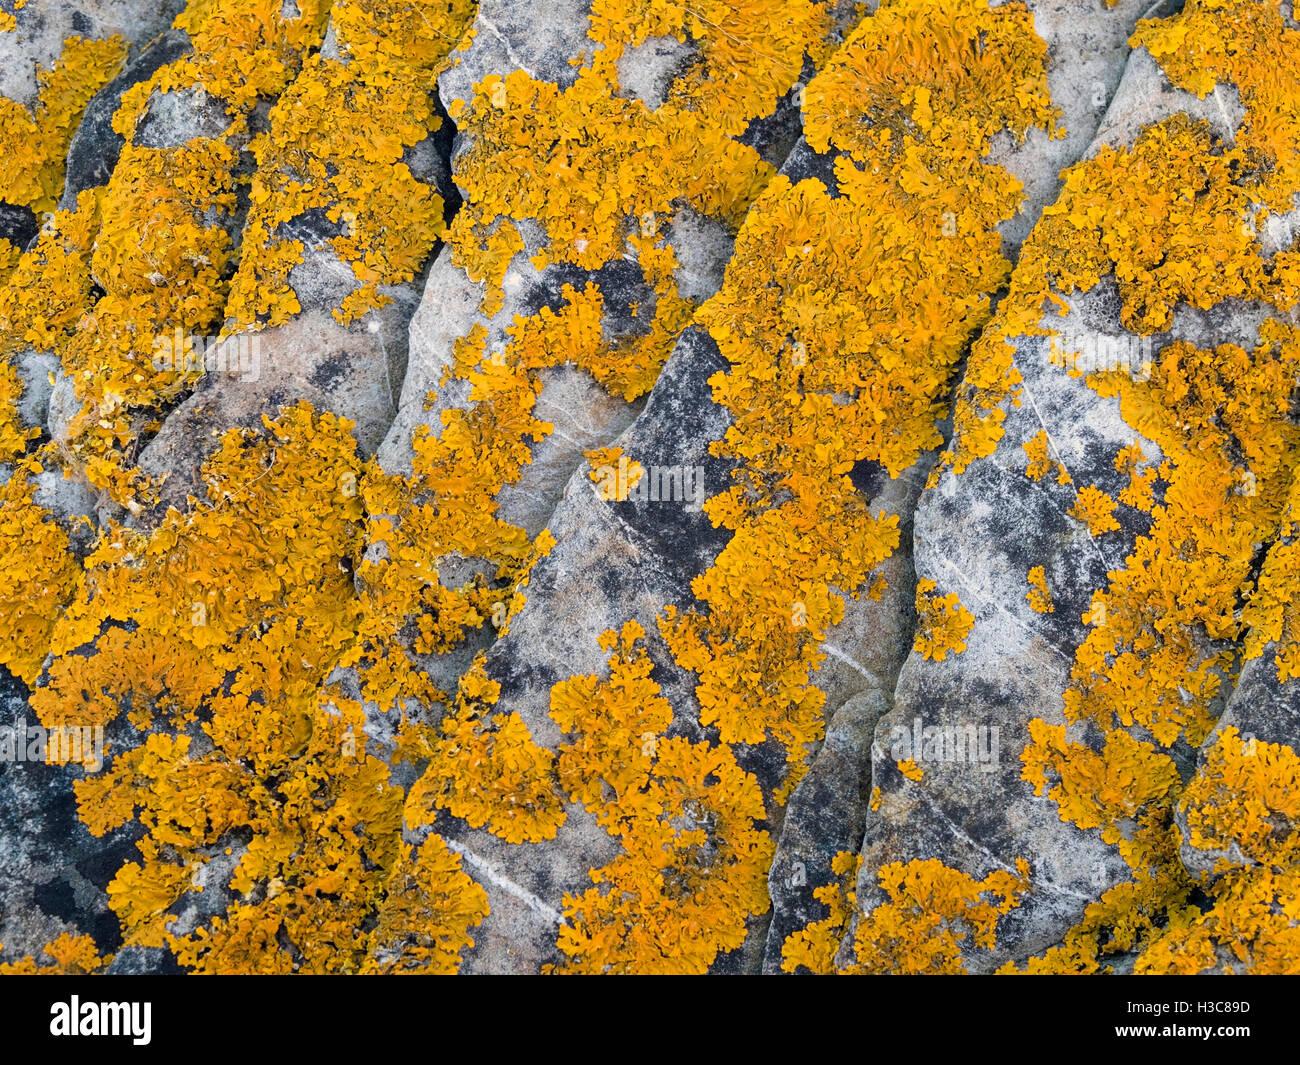 Yellow Xanthoria lichen on coastal seashore rocks, Scotland, UK. - Stock Image